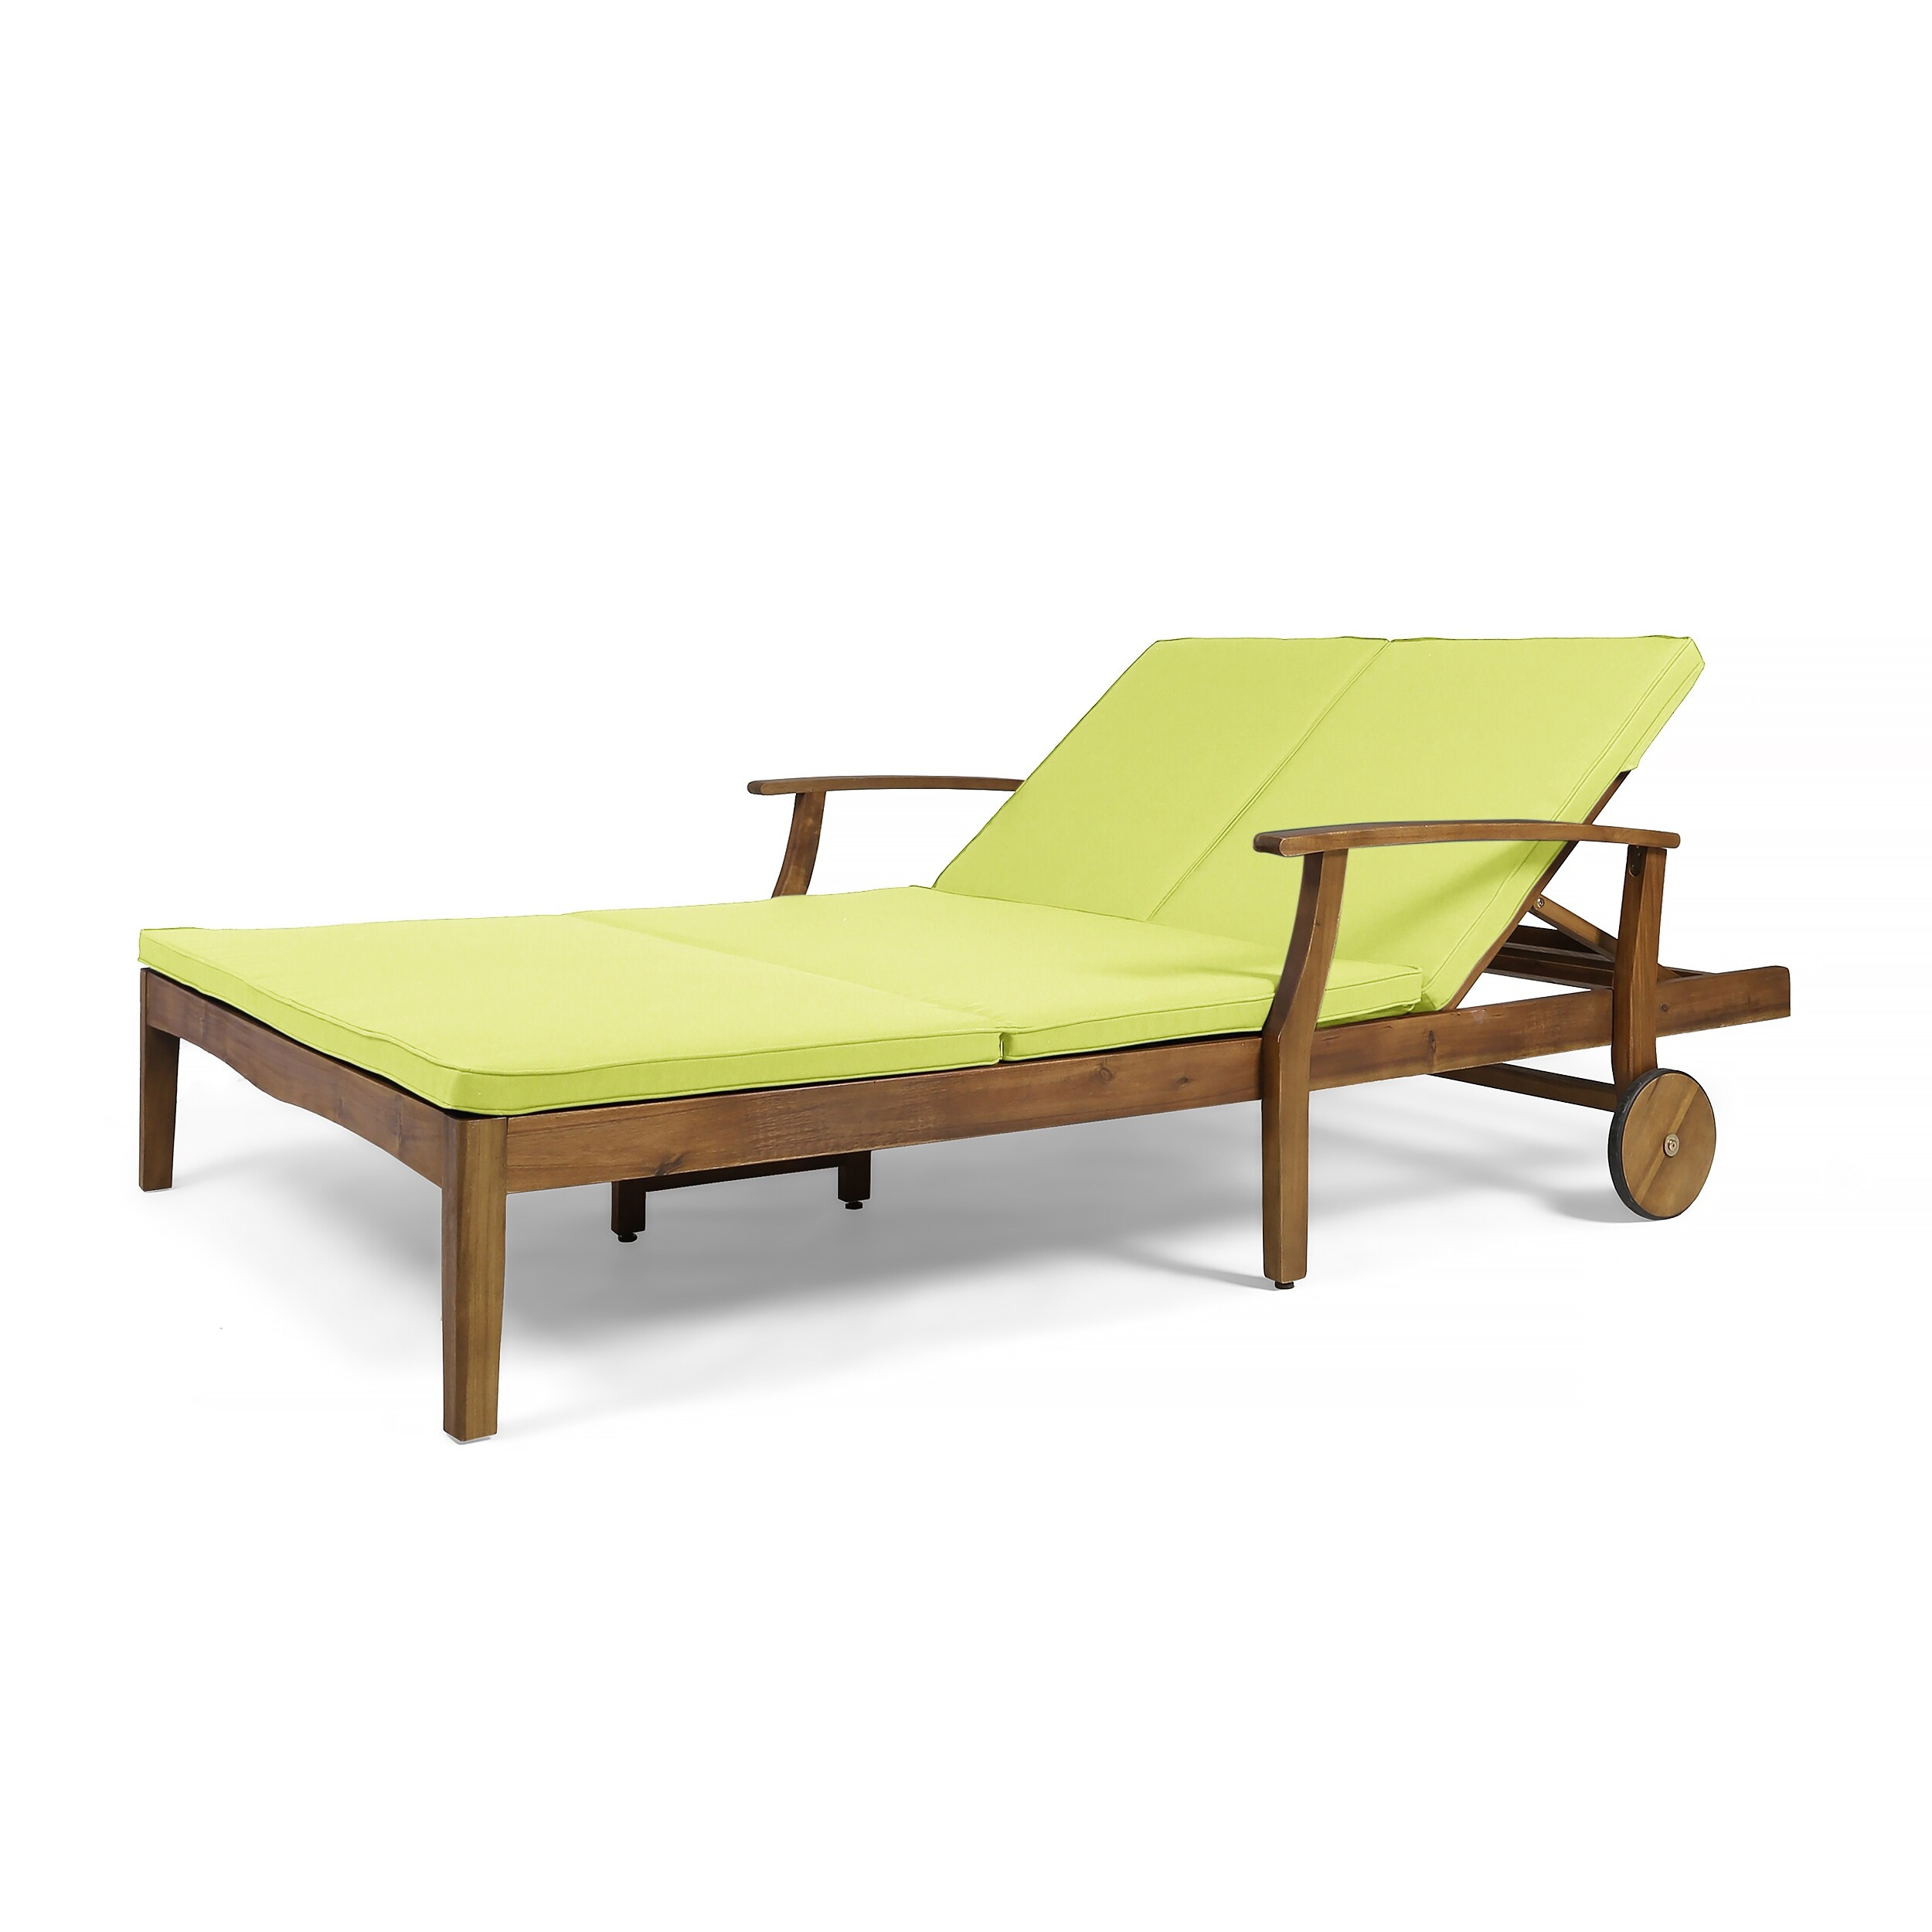 Perla Outdoor Acacia Wood Double Chaise Lounge By Teak Finish Green Walmart Com Walmart Com